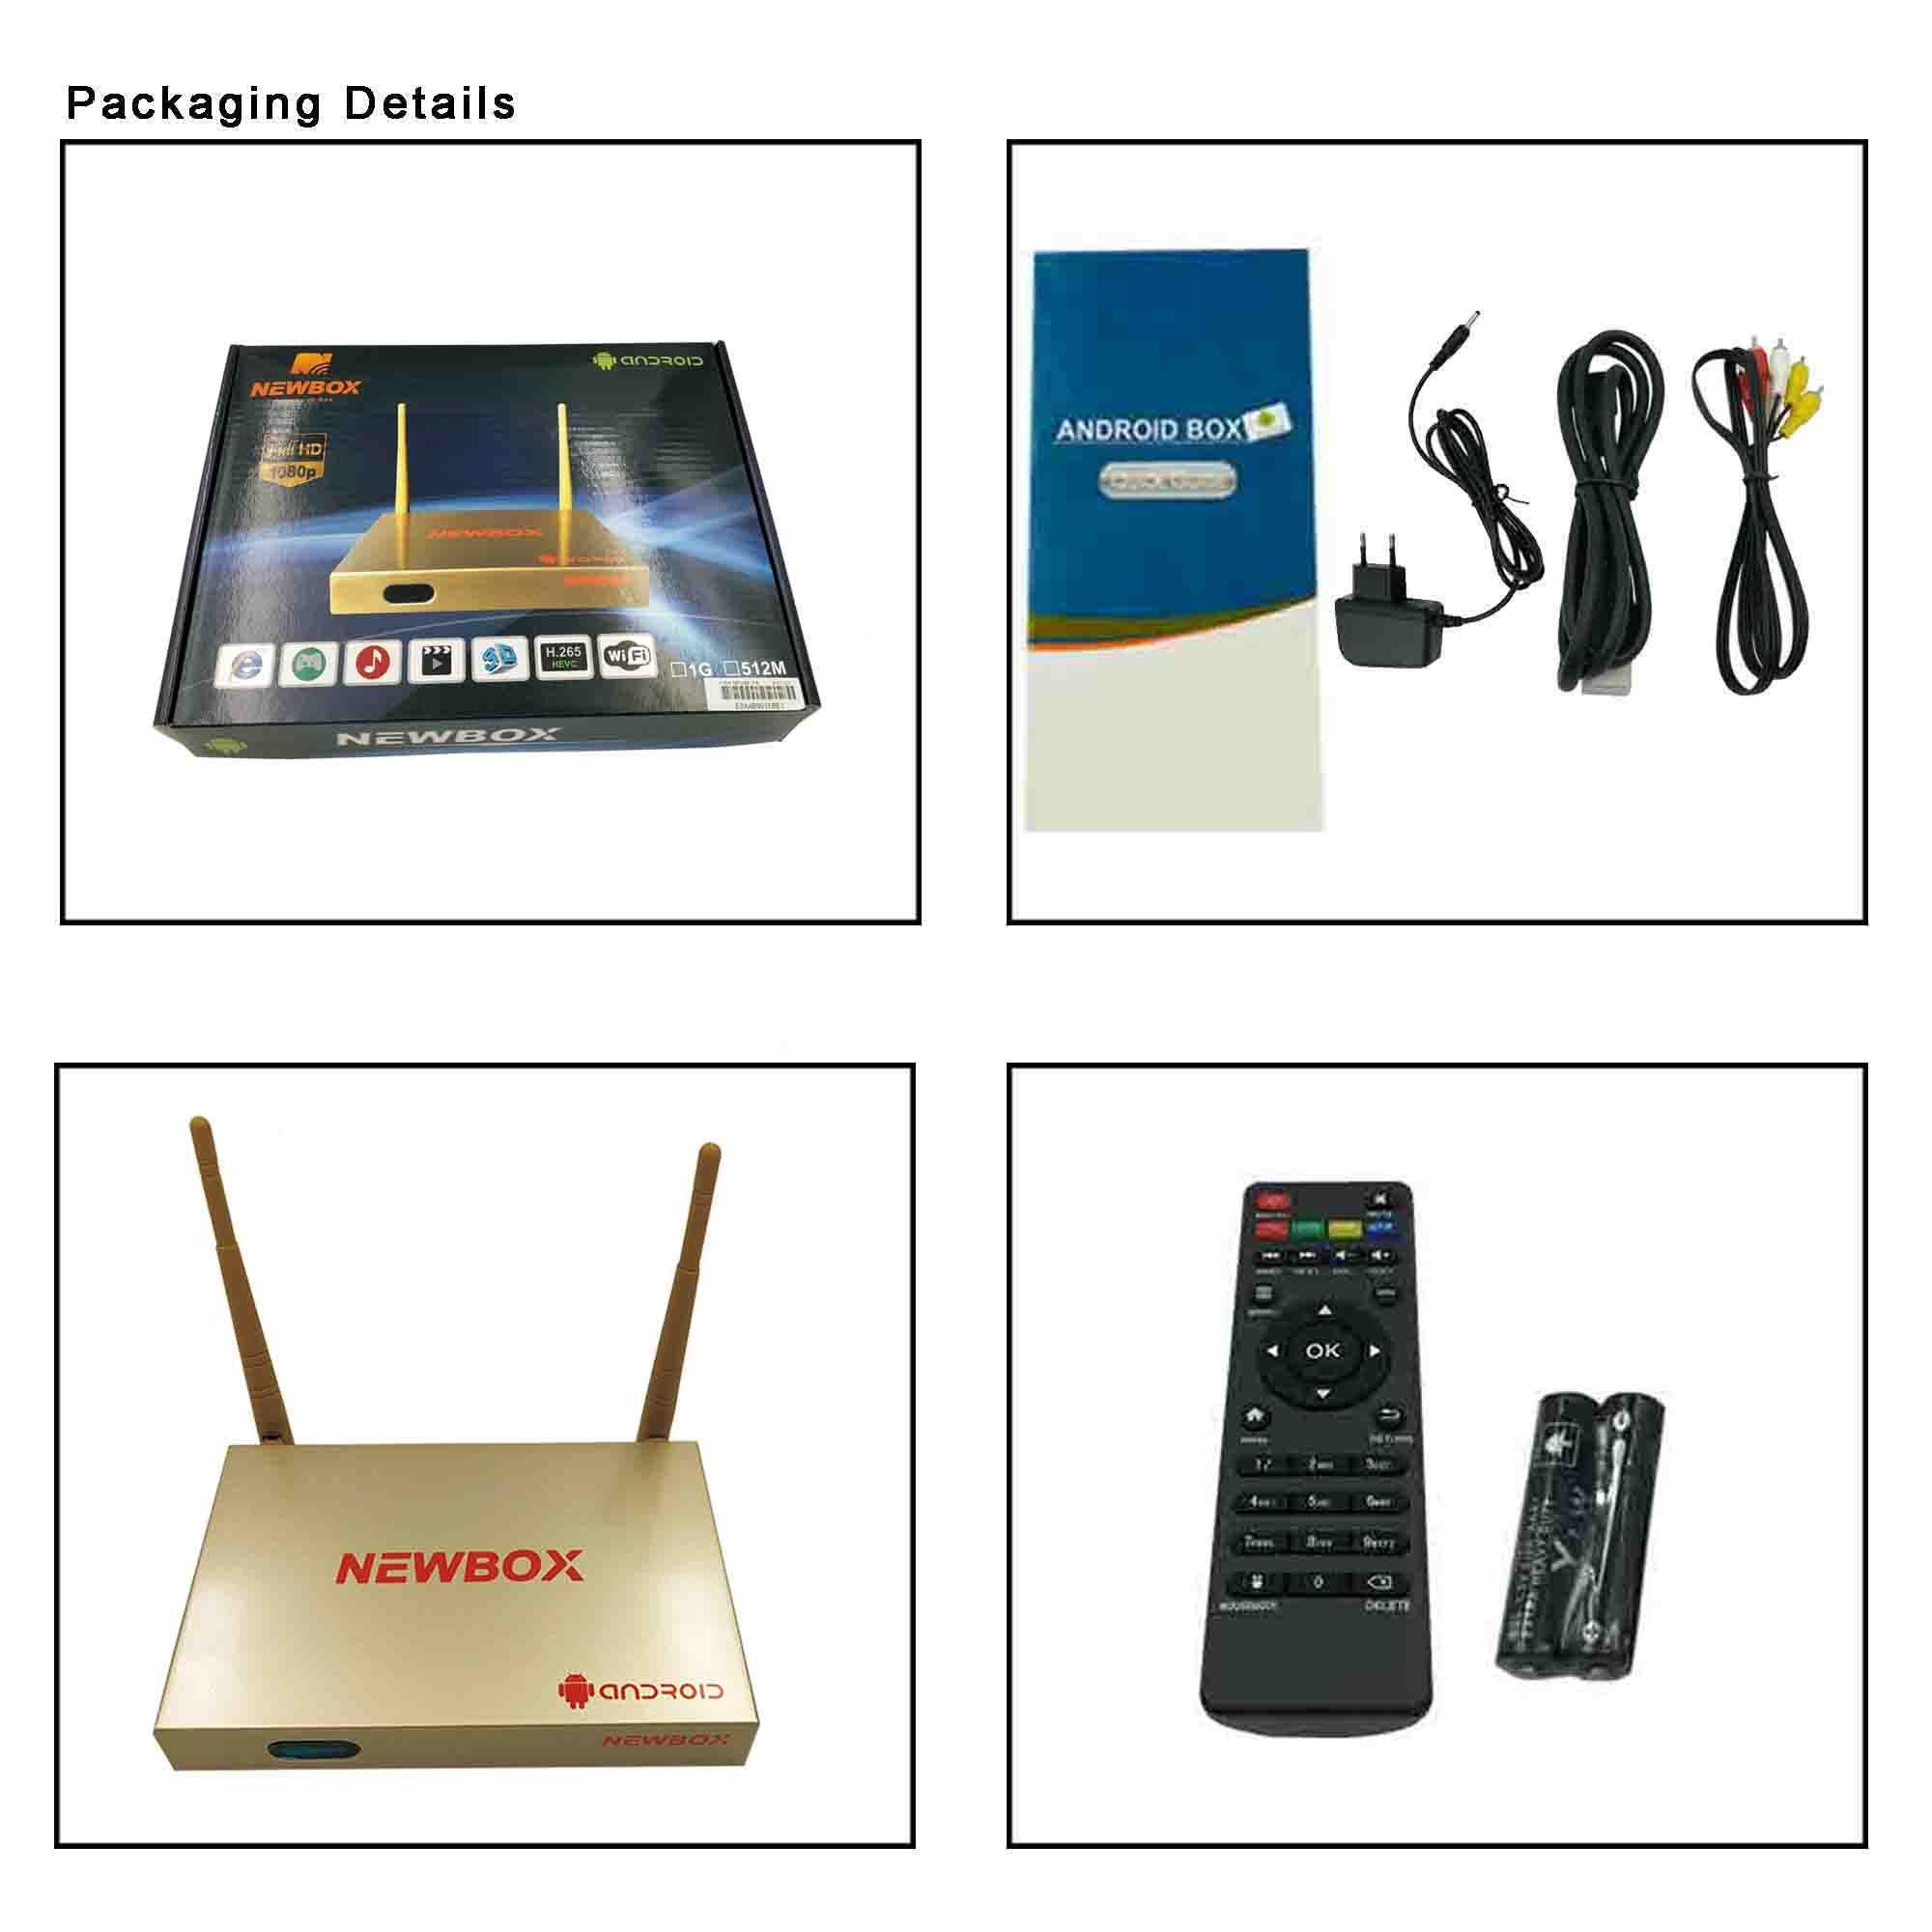 Vga Output Android Tv Box VgaOutputAndroidTvBox Android